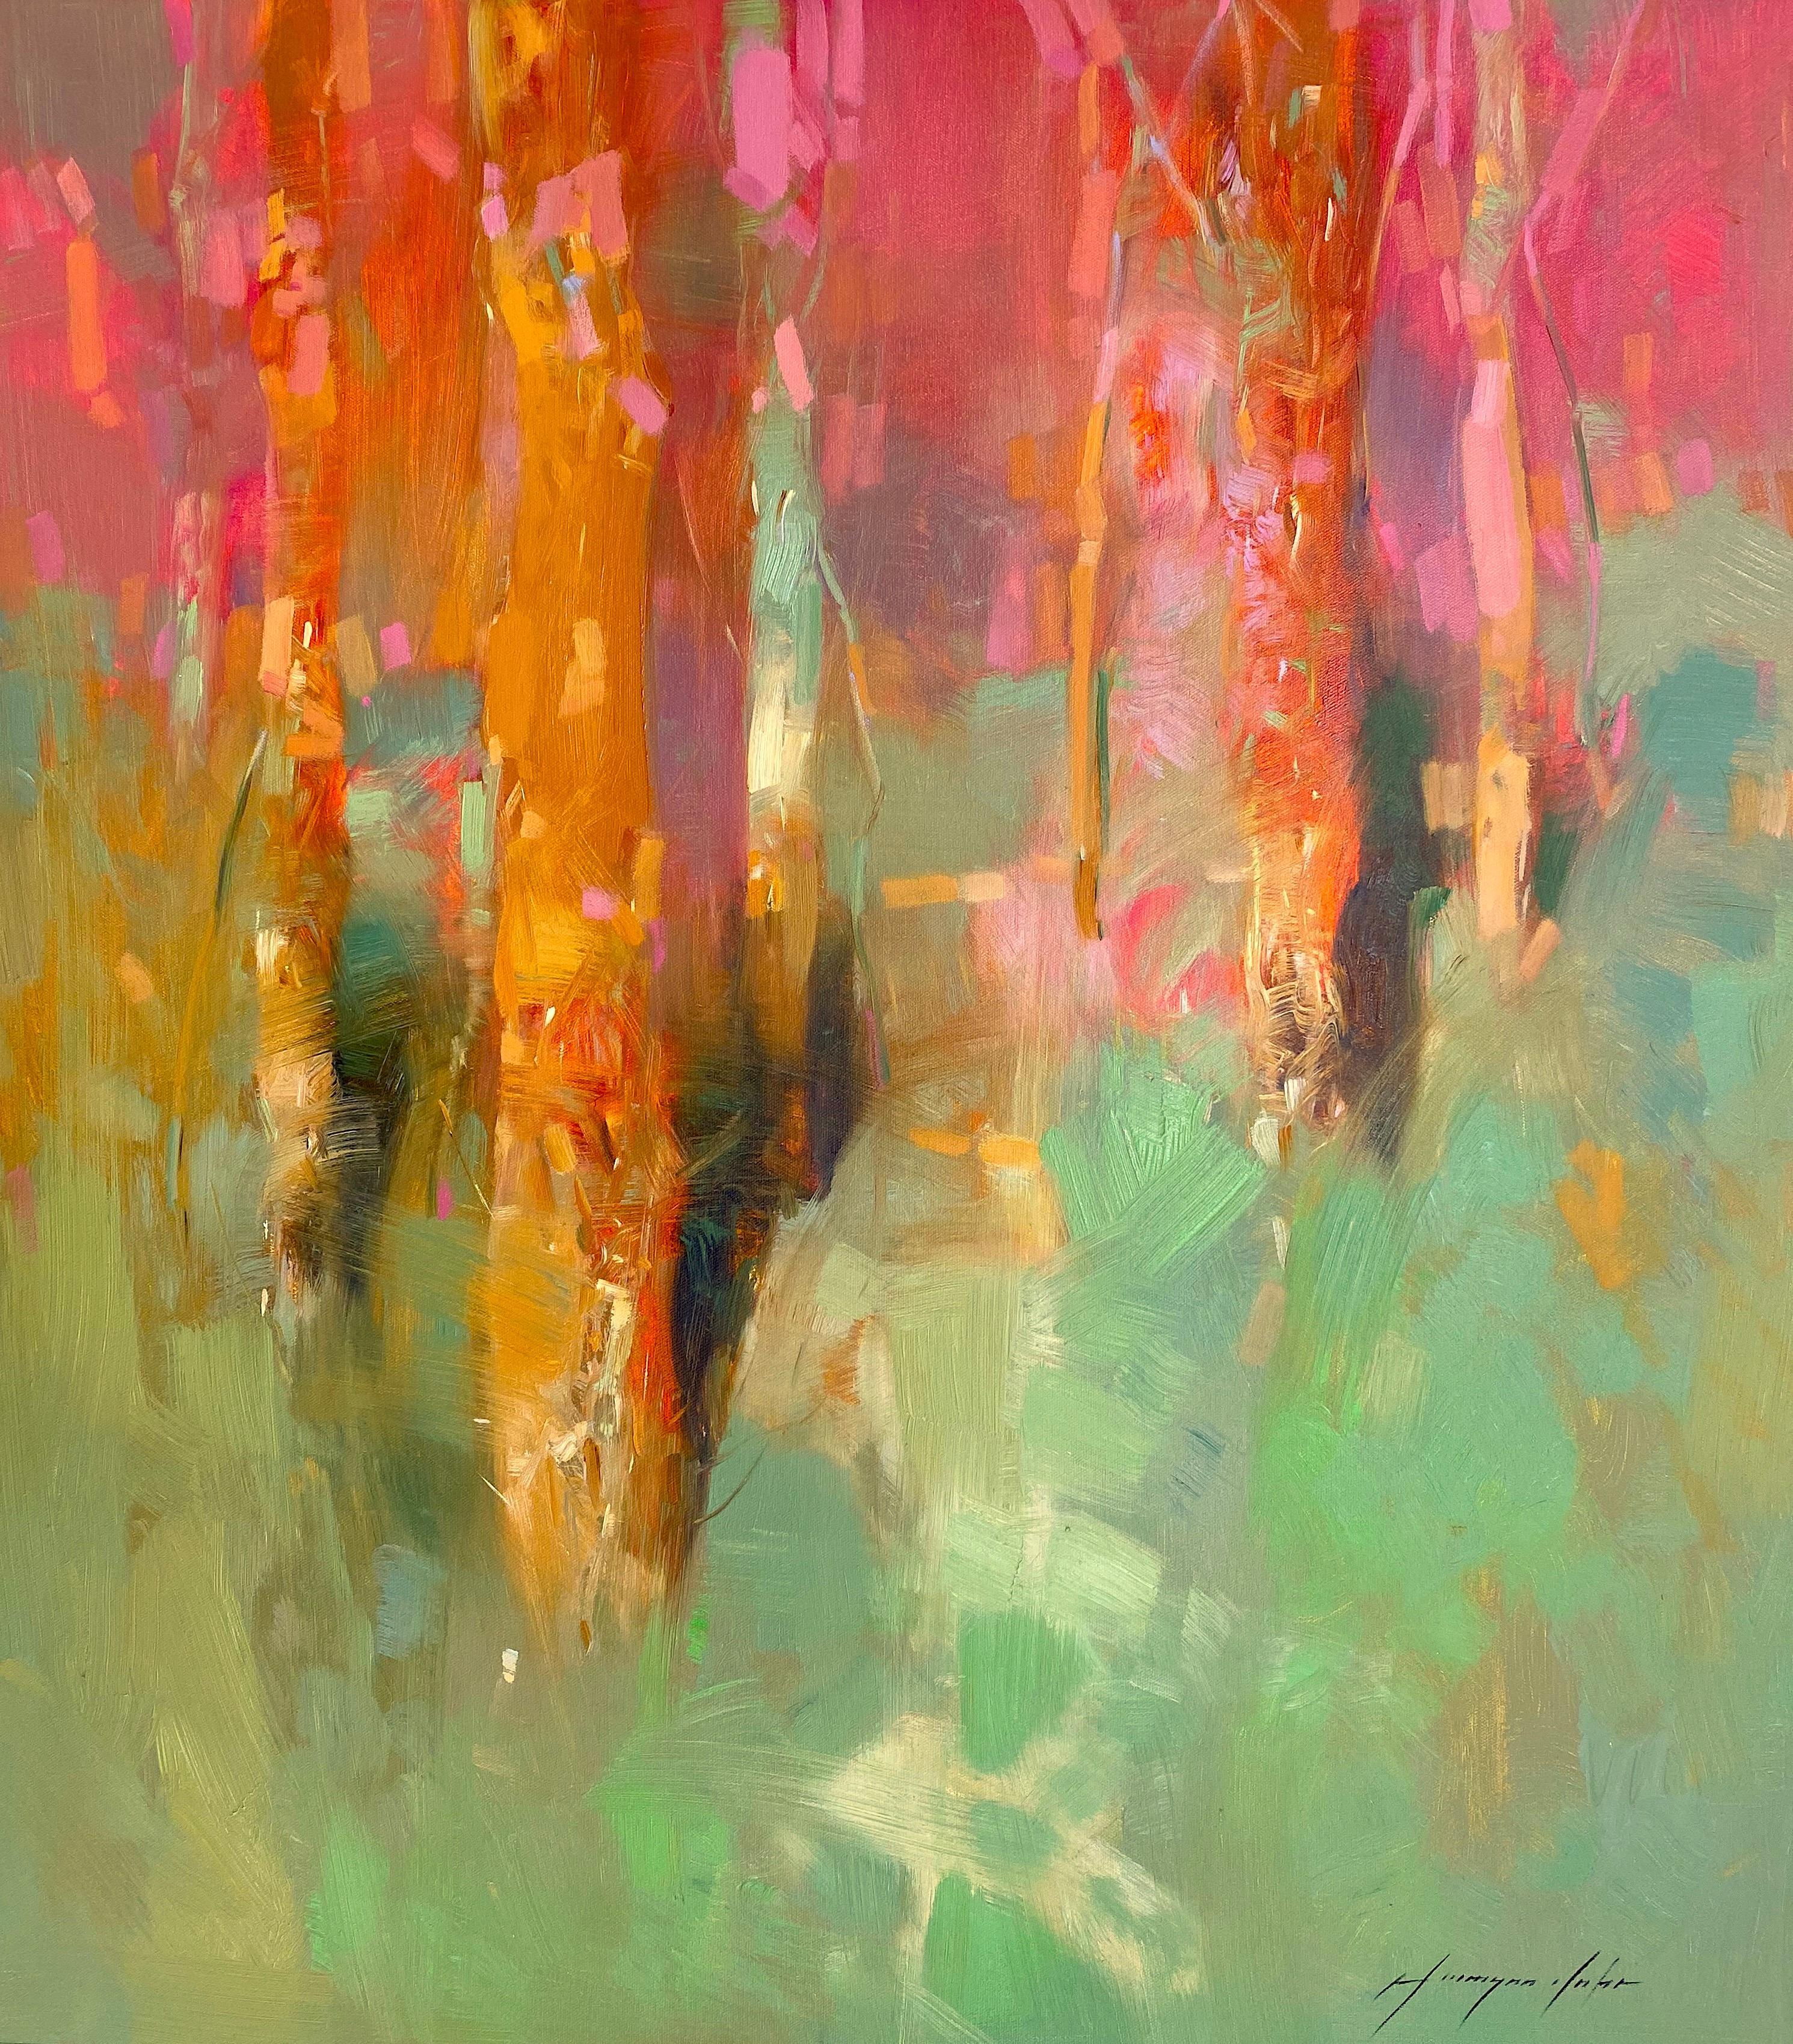 Grove, Original Oil Painting, Handmade Artwork